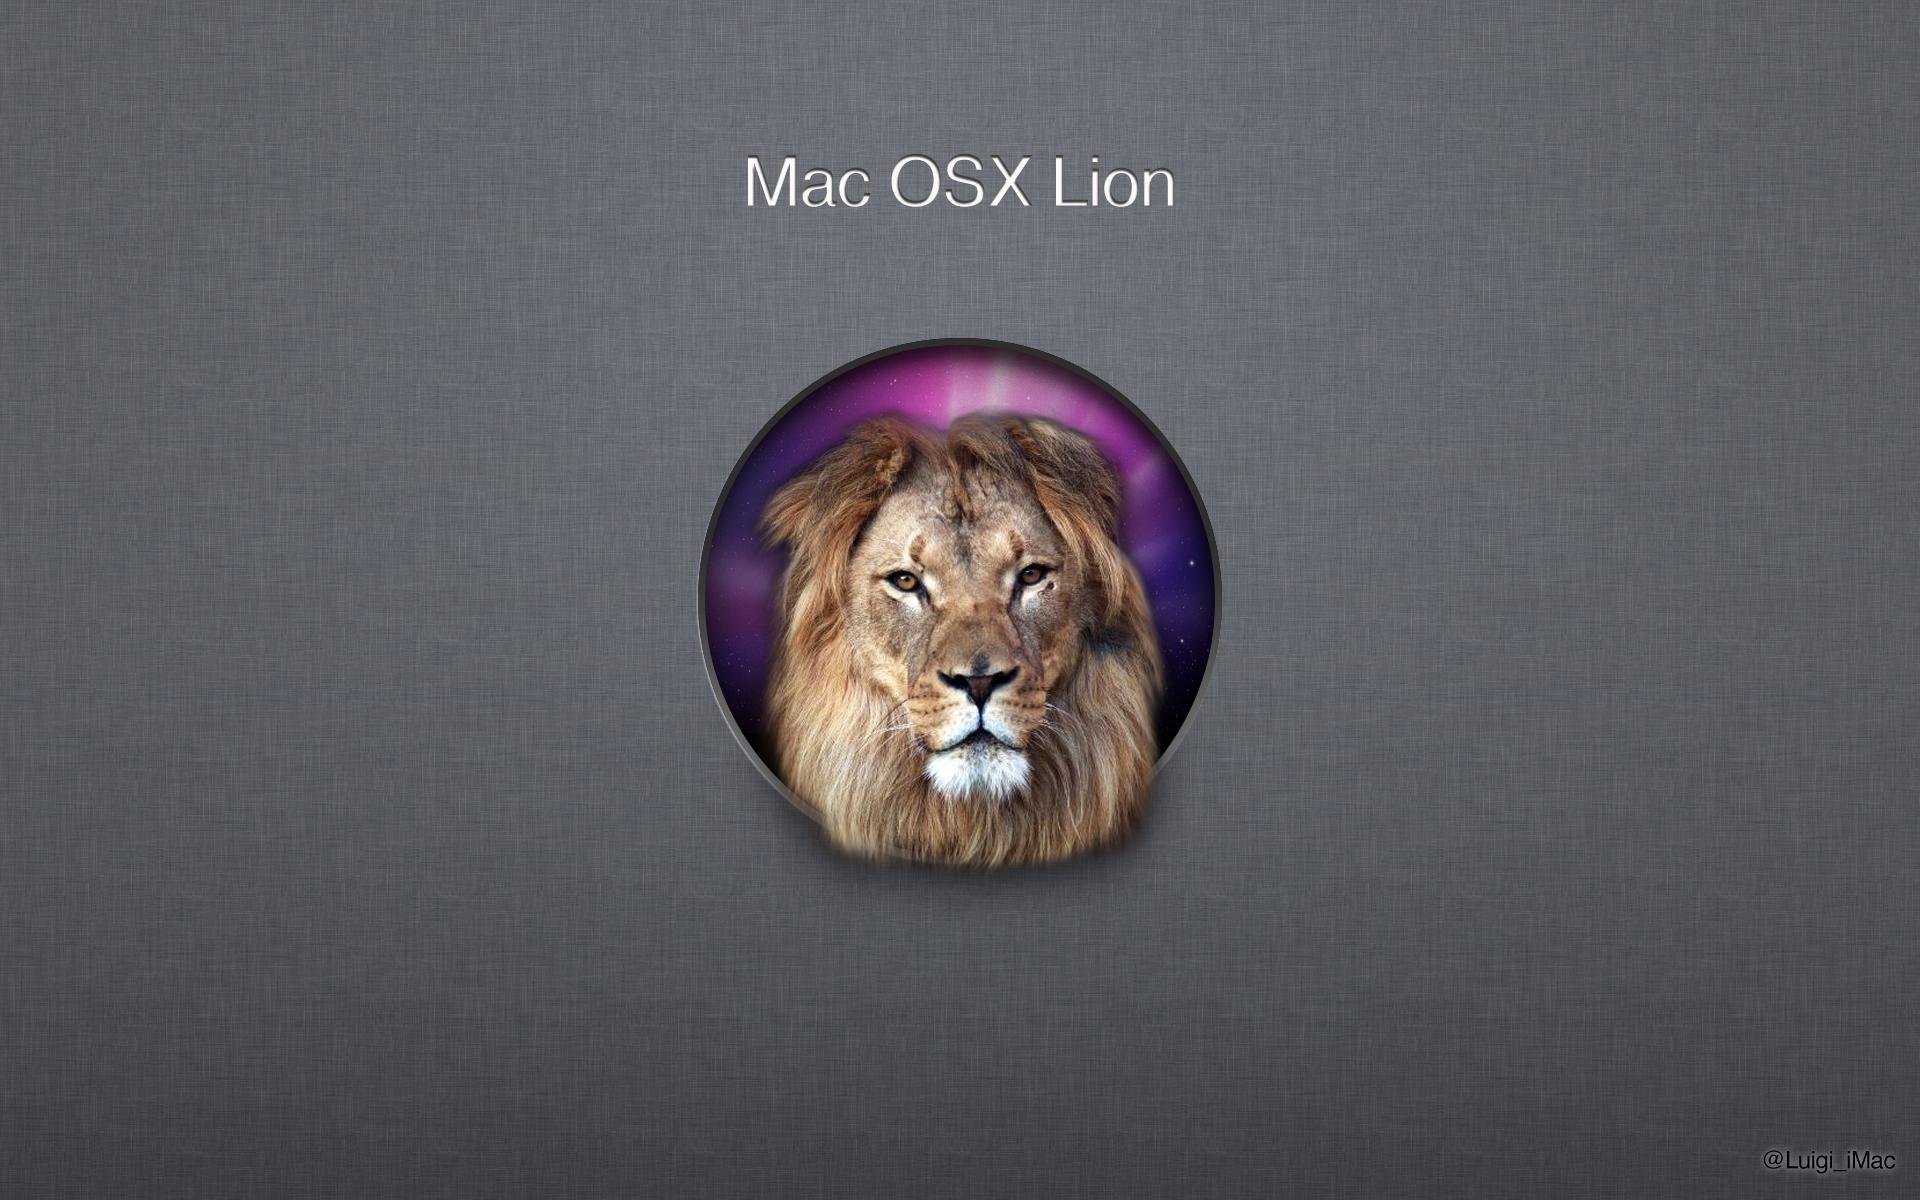 os x lion desktop wallpaper - wallpapersafari